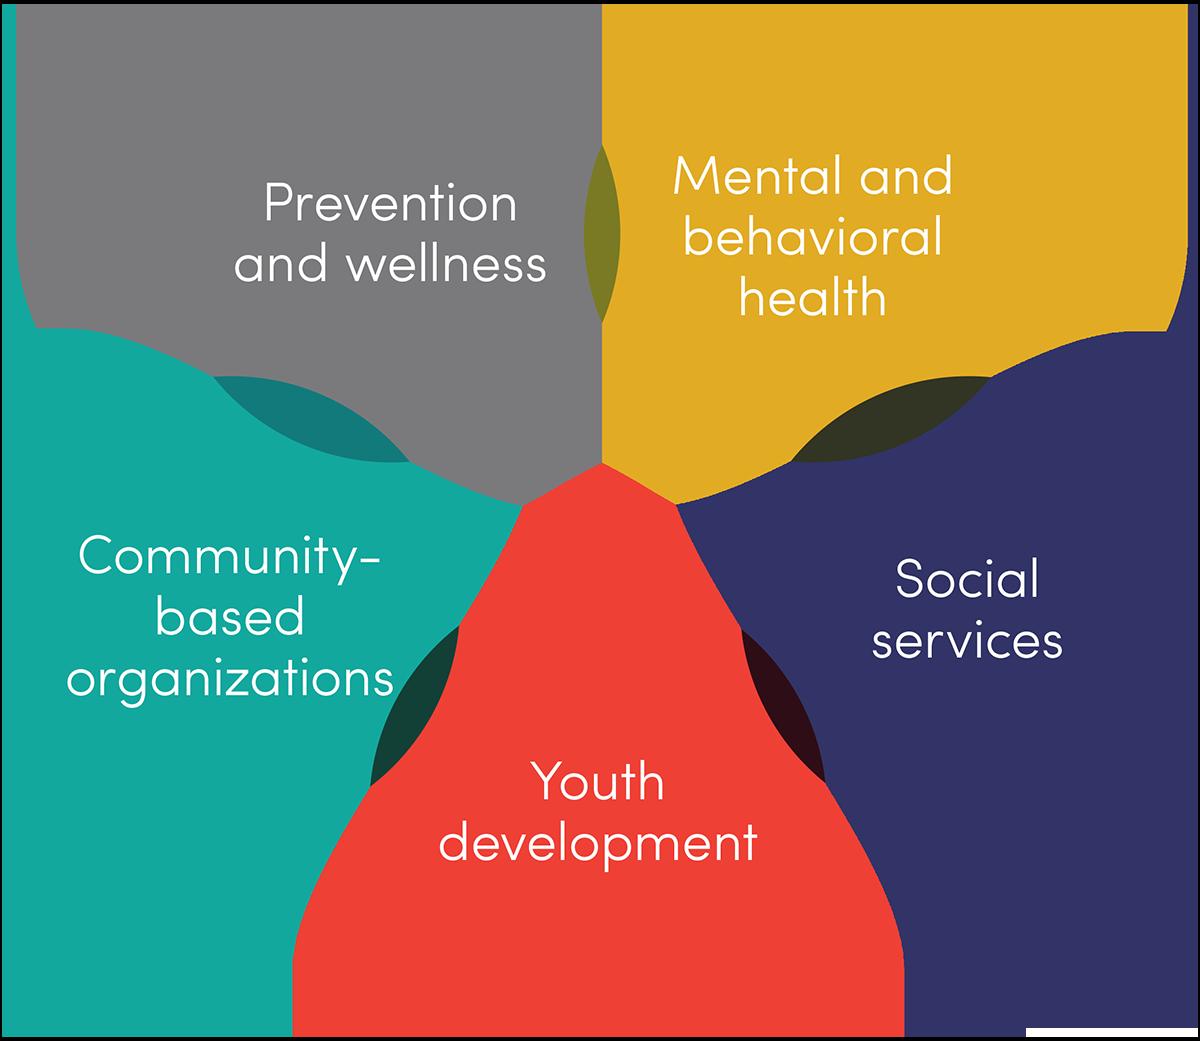 Prevention & Wellness, Mental & behavioral health, Social Services, Youth development, Community based organizations